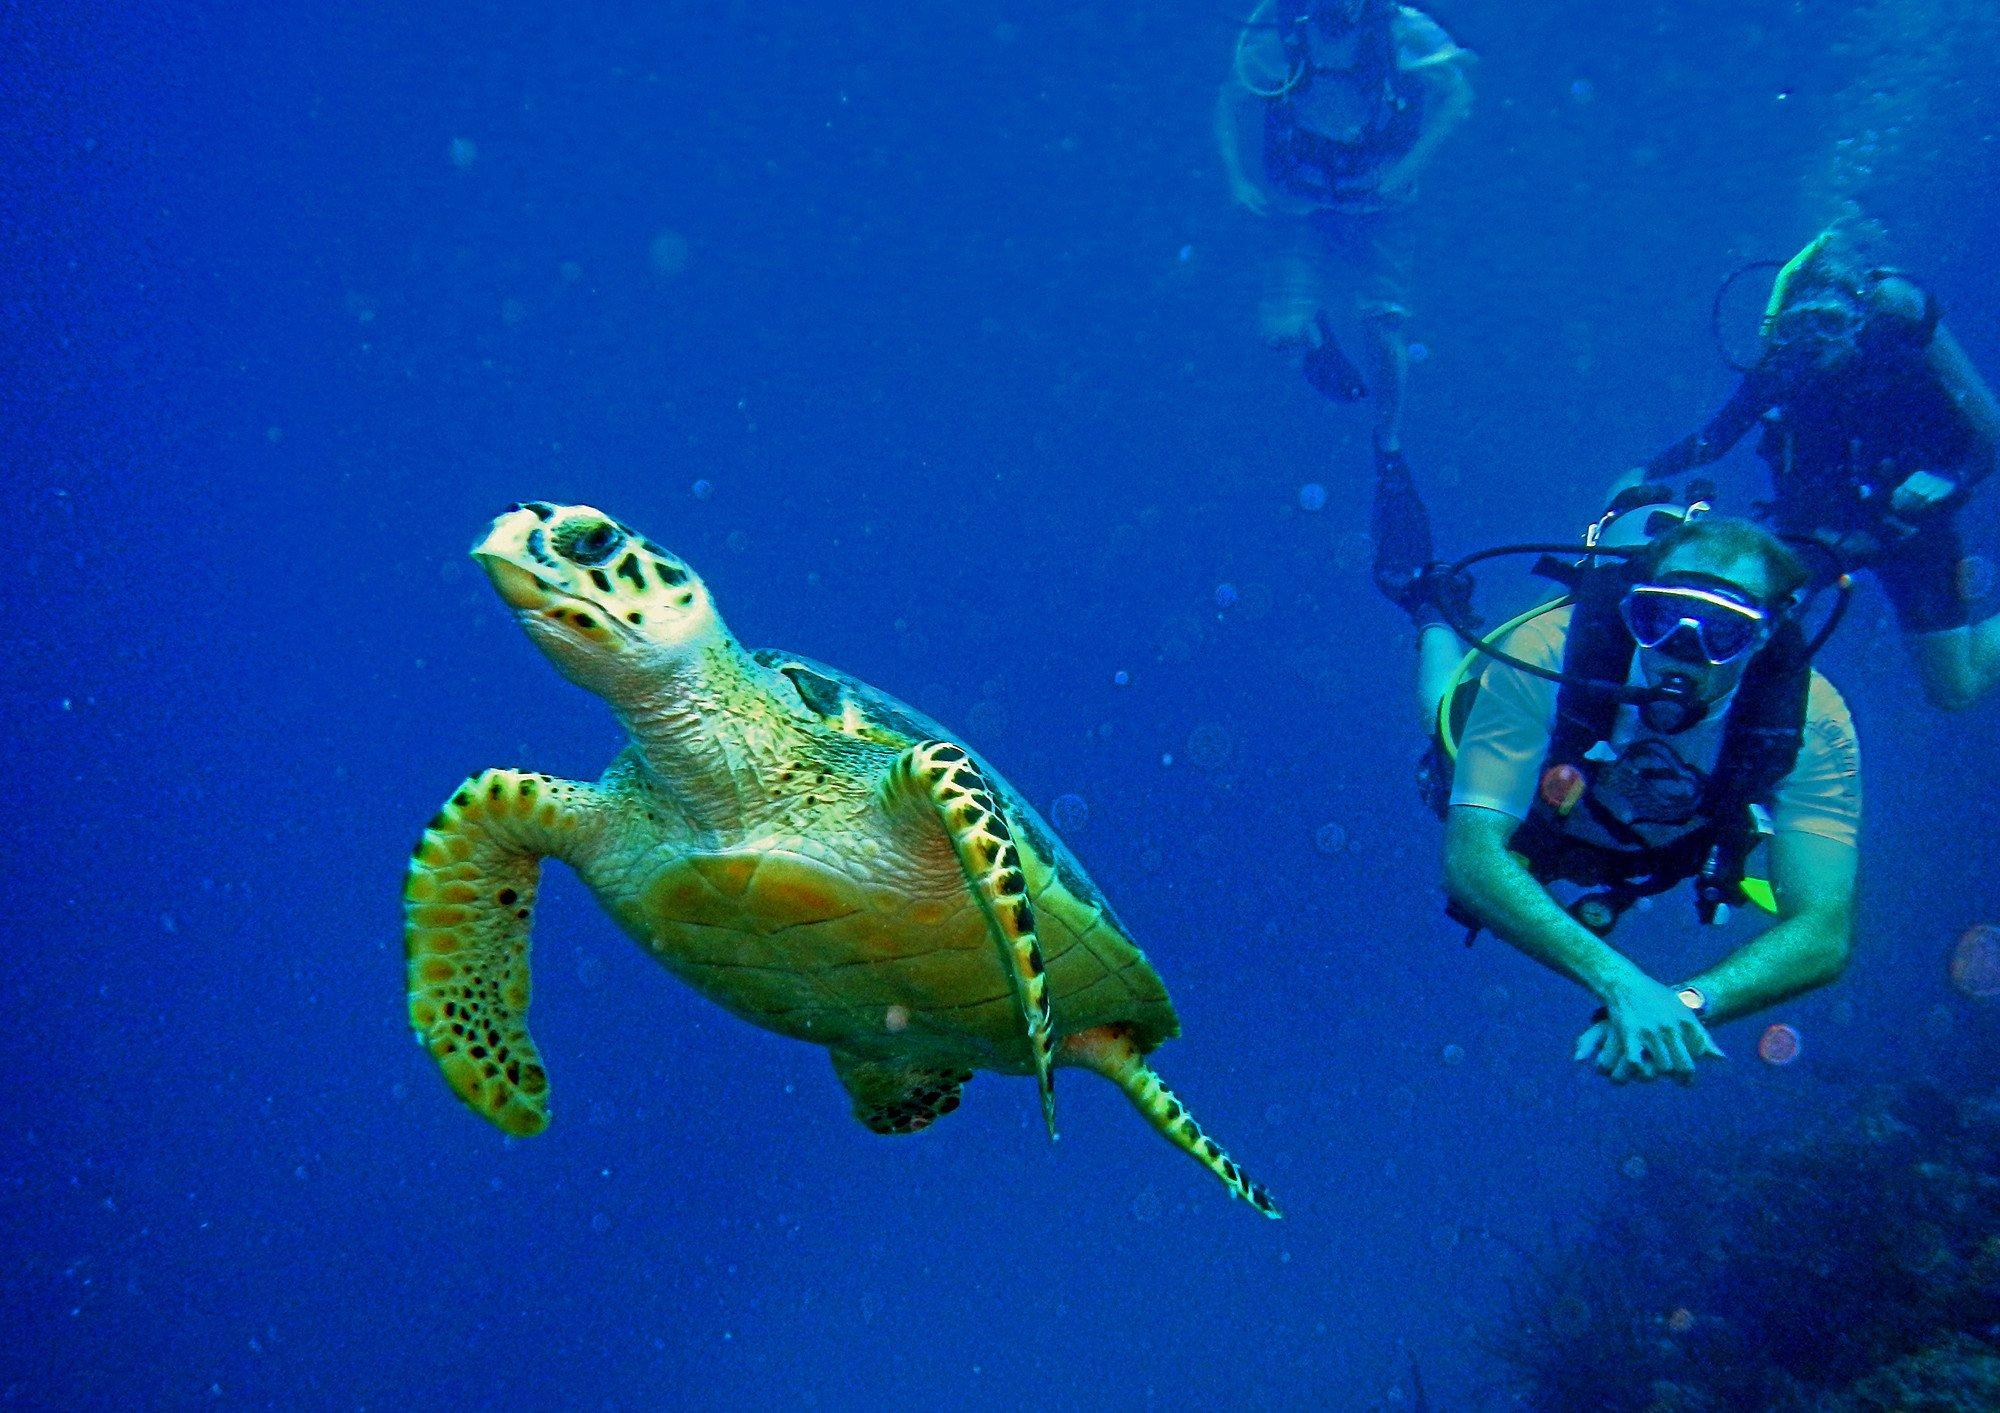 Scuba Diving Diver Ocean Sea Underwater Turtle Wallpaper